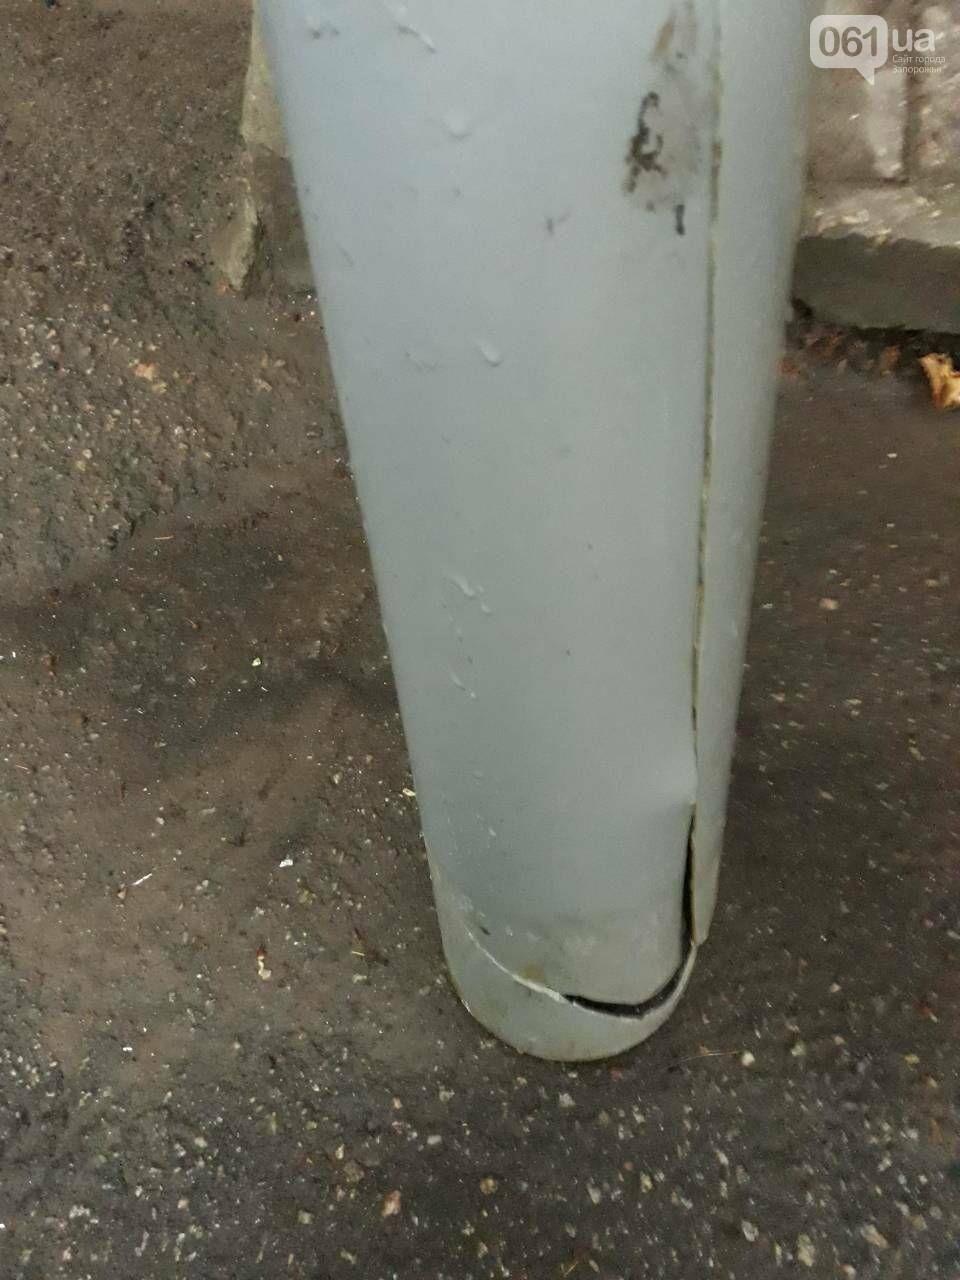 В Запорожье из-за управляющей компании подъезд заливает водопадом, - ФОТО, ВИДЕО, фото-4